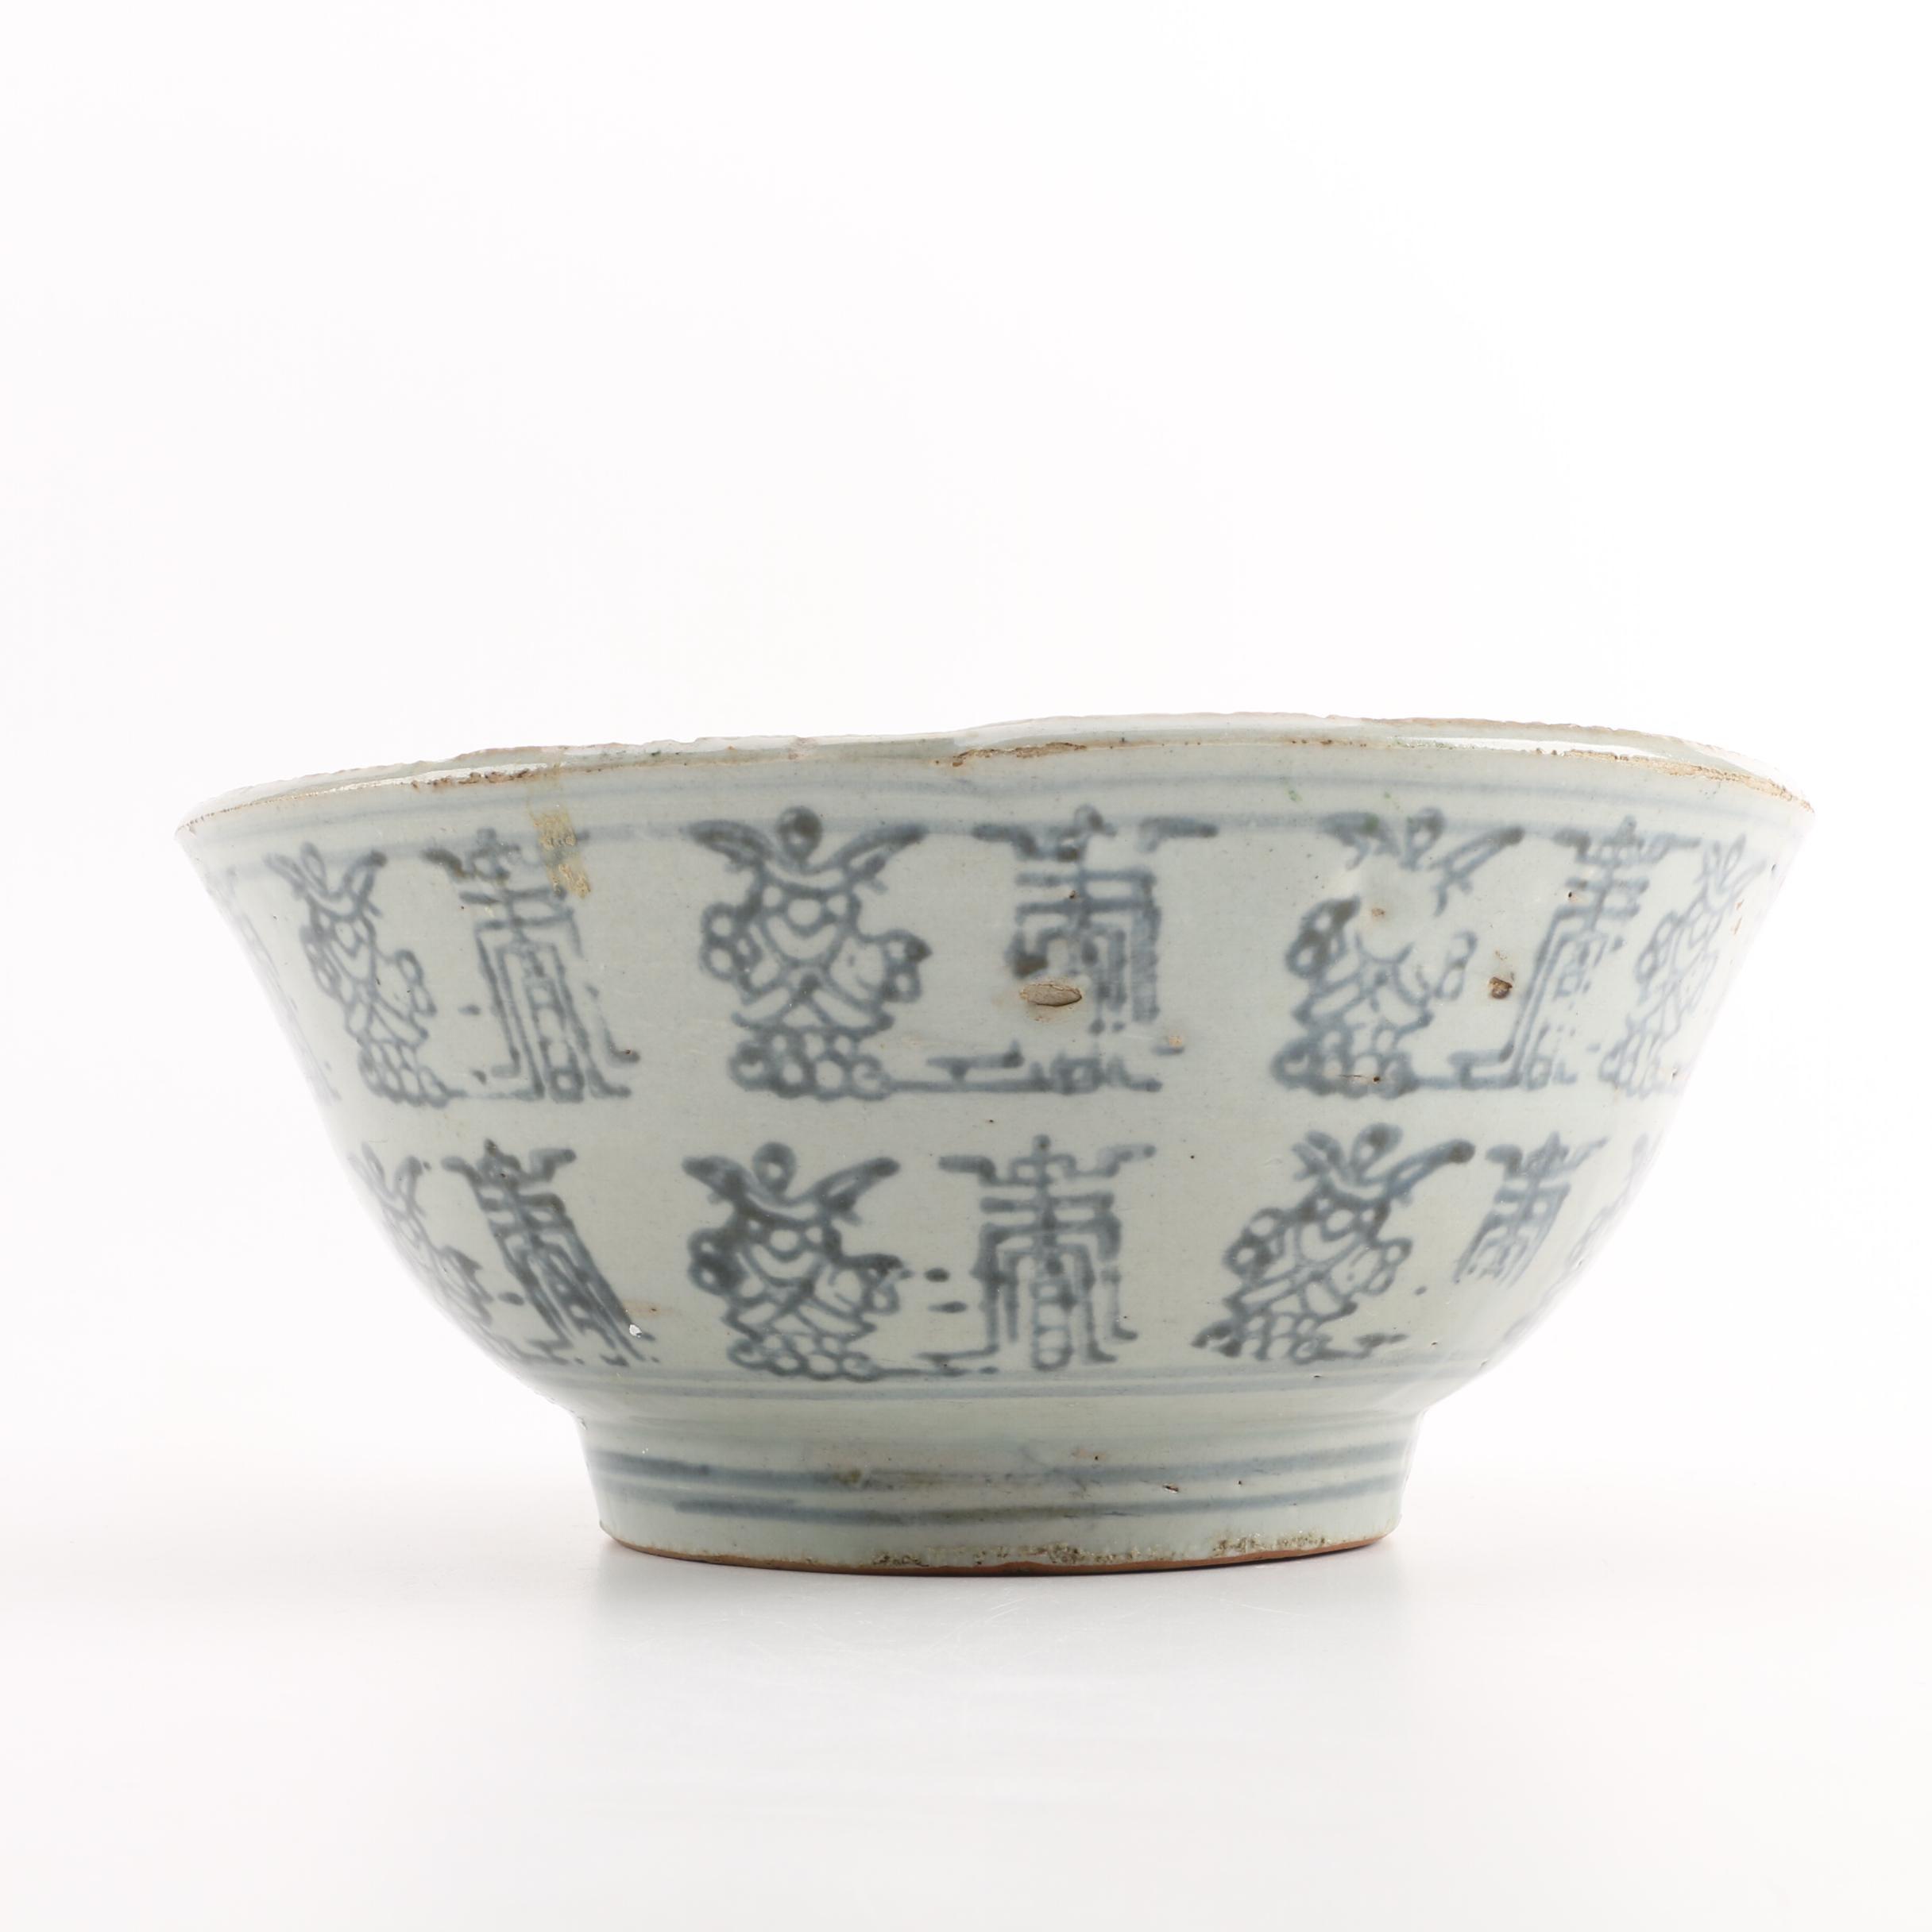 Chinese Ming Dynasty Zhangzhou Ware Bowl